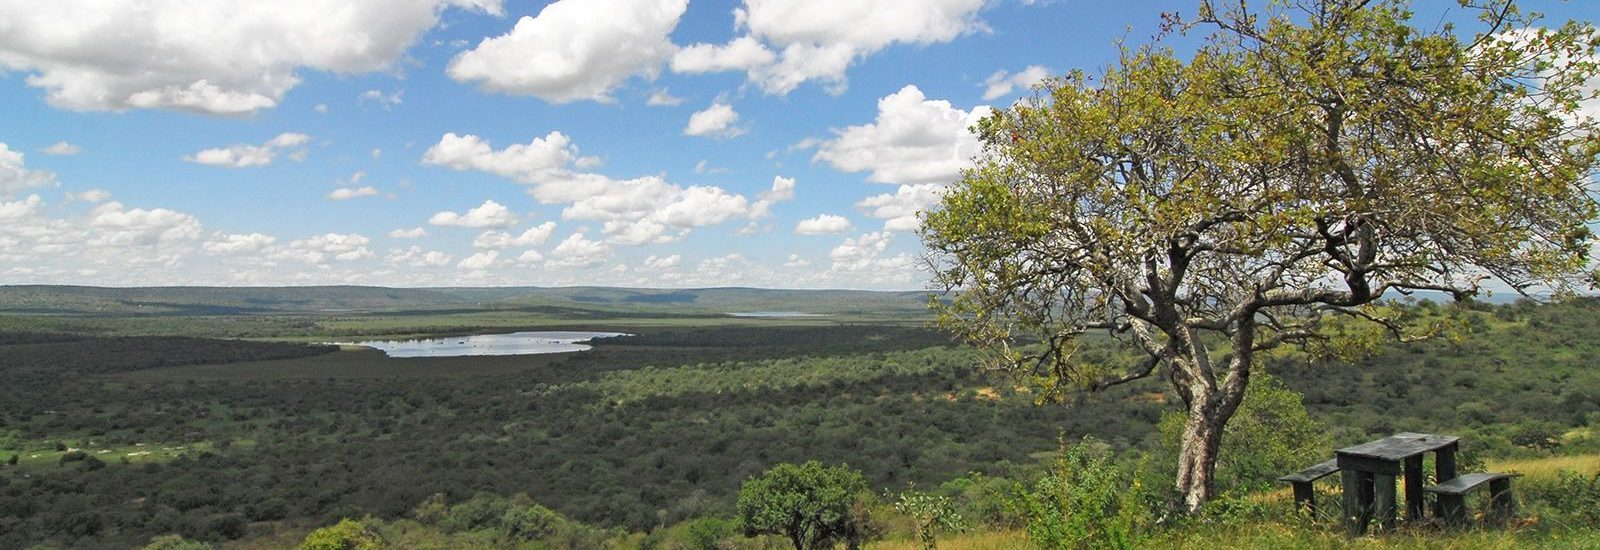 14 Days Uganda Wildlife Adventure Vacation